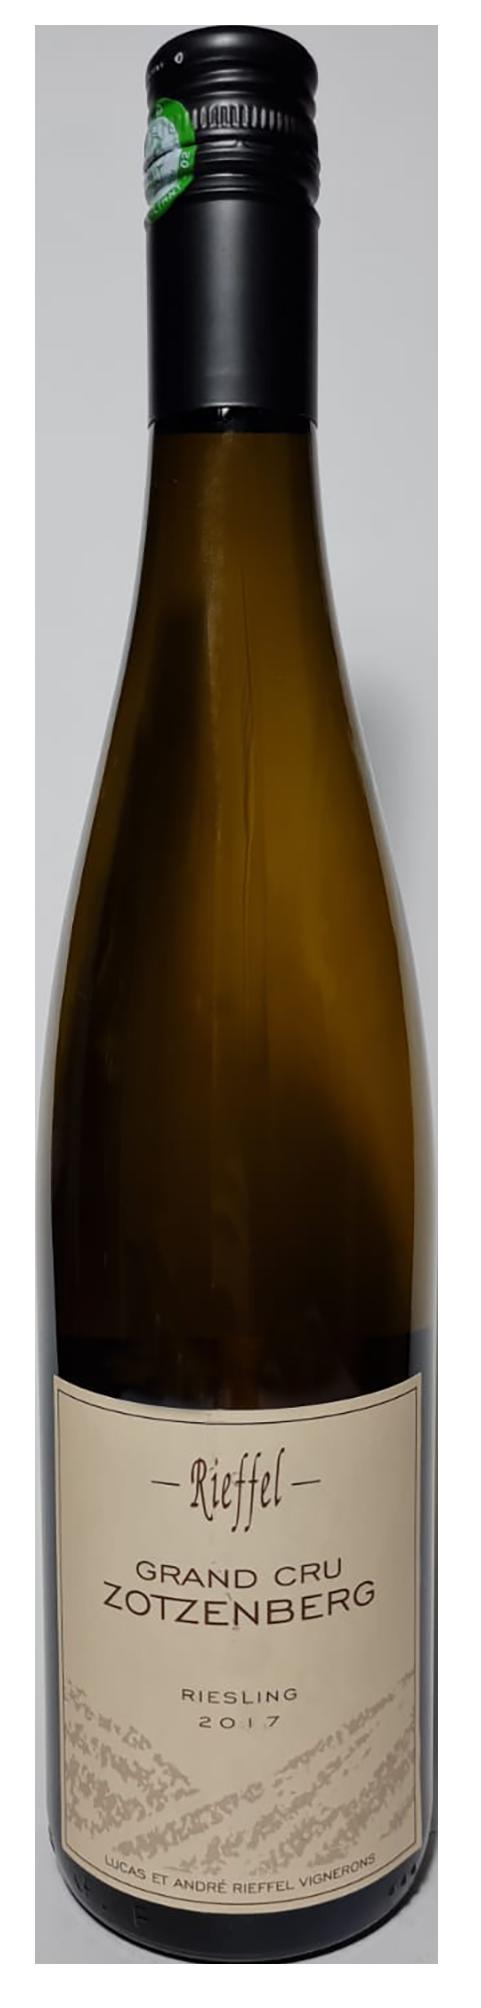 Bouteille de vin blanc naturel, Riesling Grand Cru Zotzenberg 2017 Domaine Rieffel